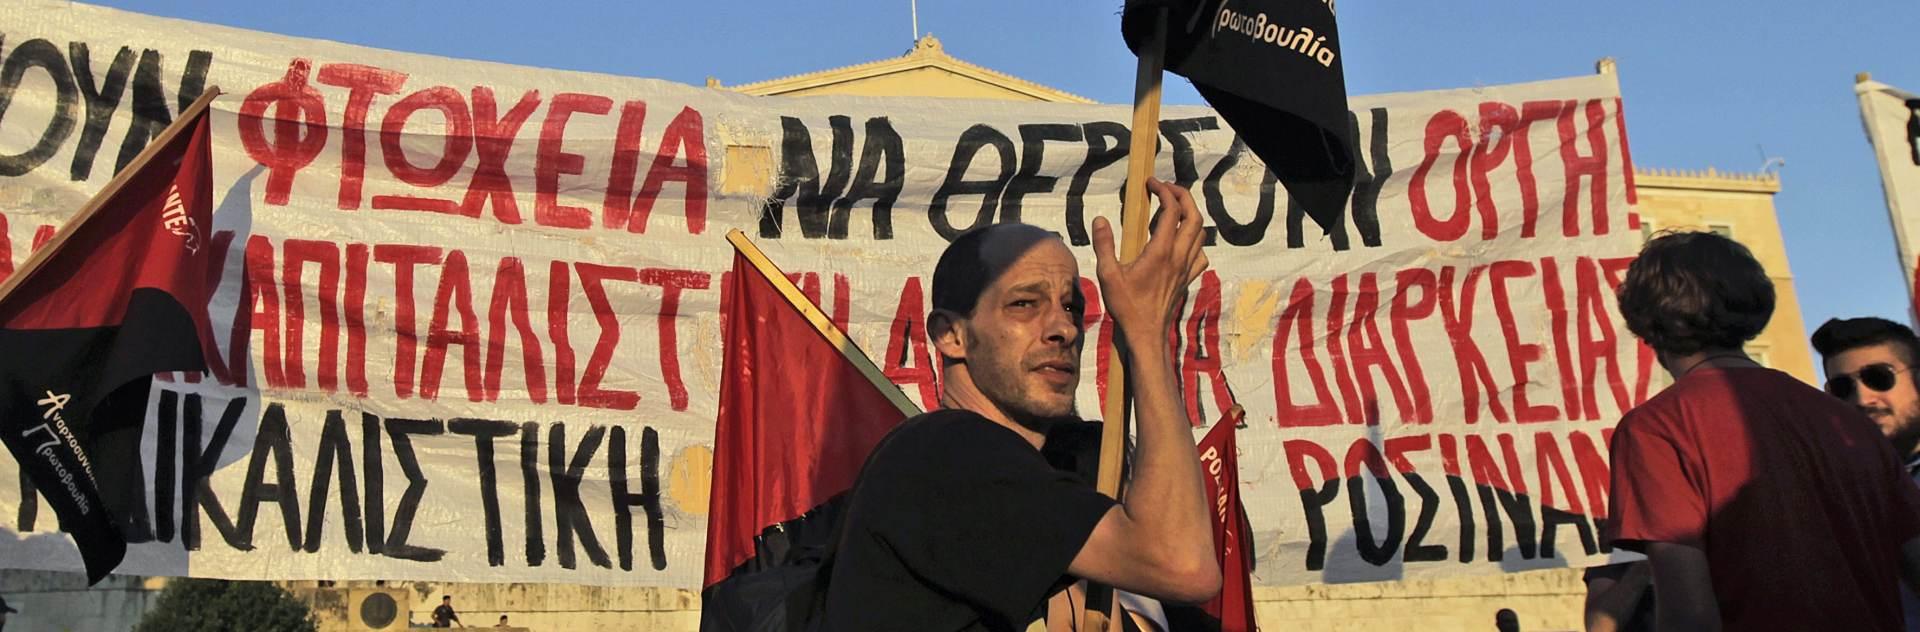 POMOĆ GRČKOJ: Francuski parlament odobrio početak pregovora